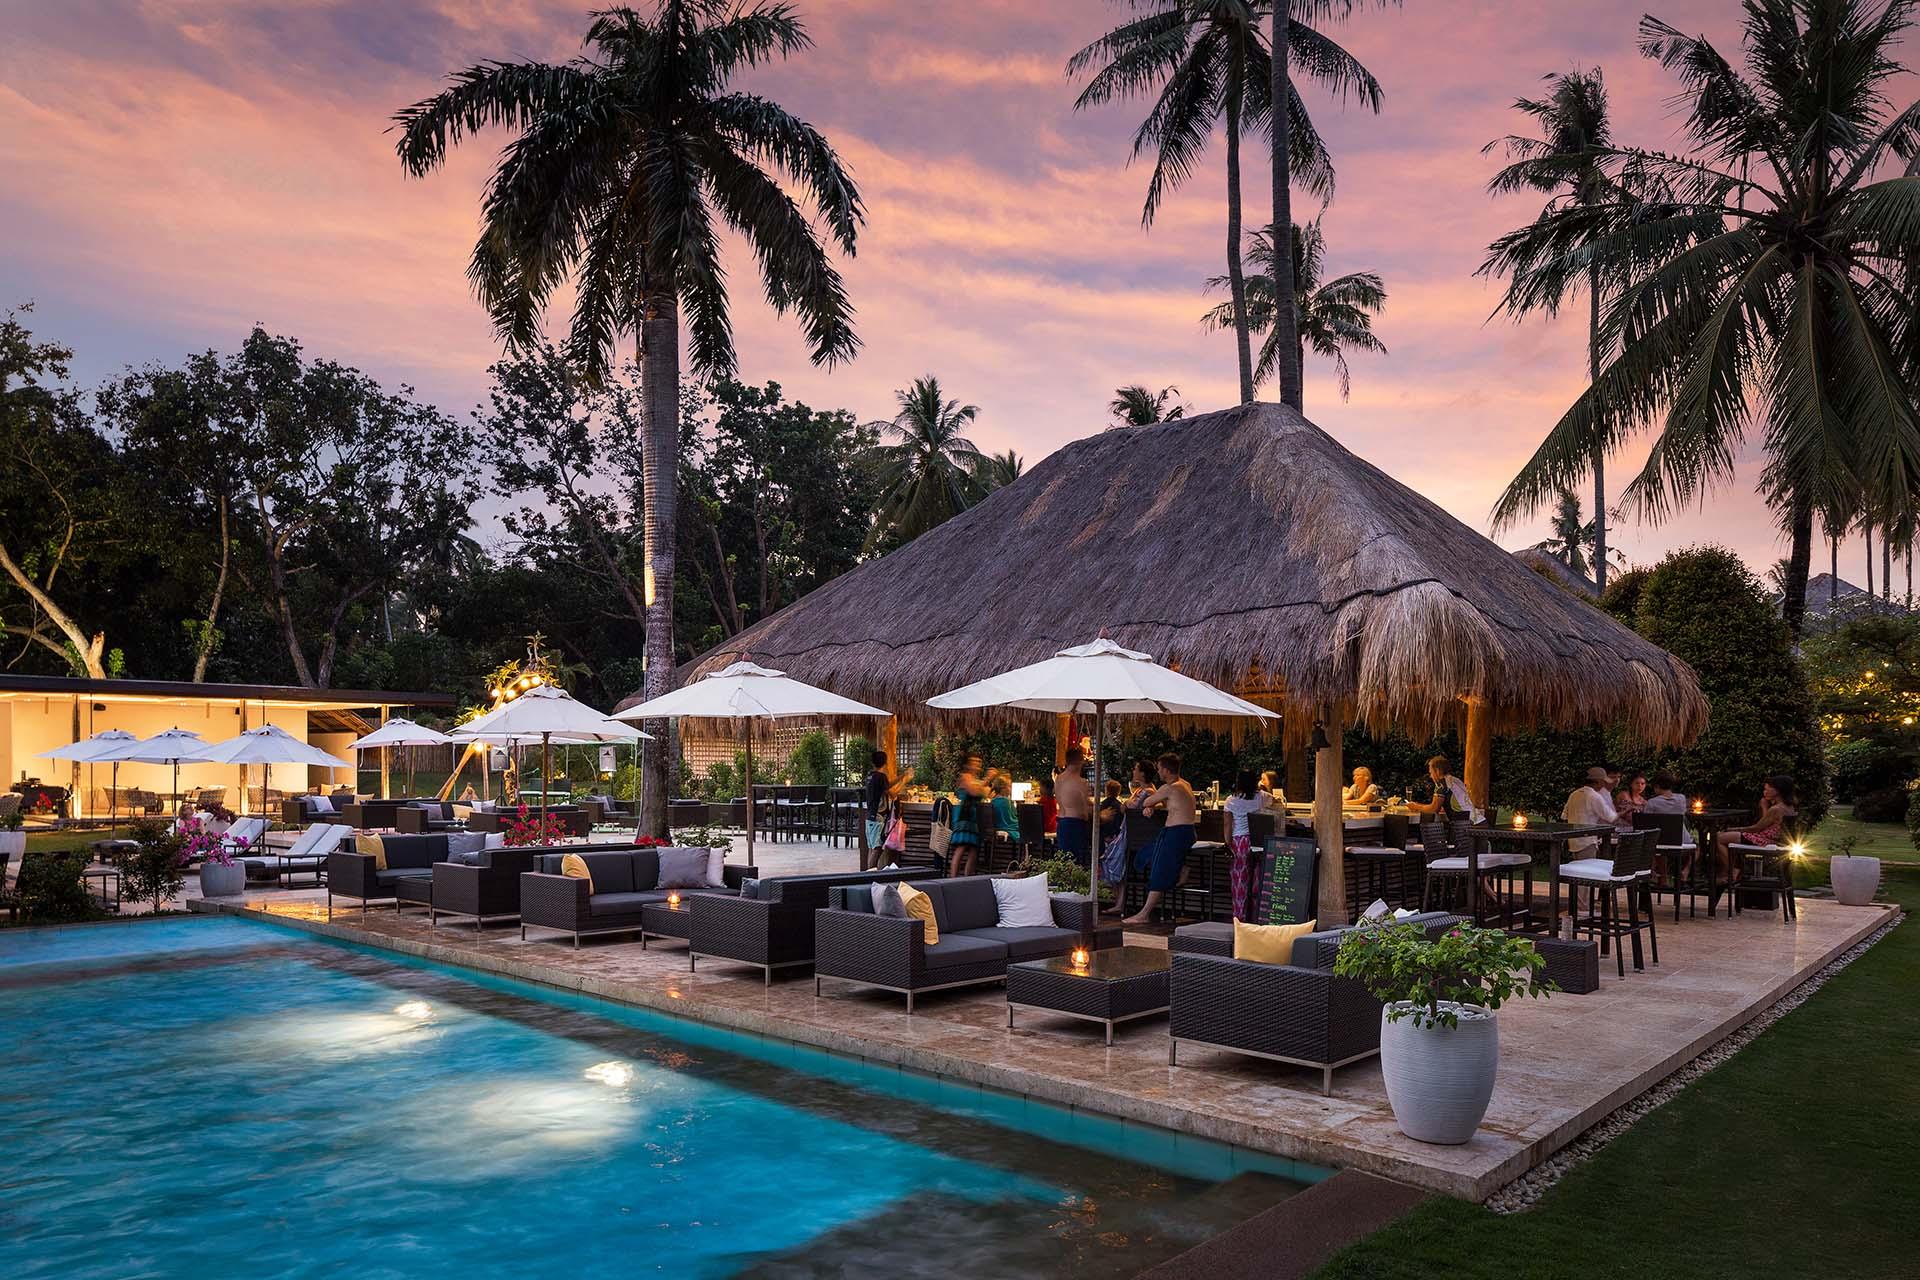 Poolside bar at Atmosphere Resorts & Spa